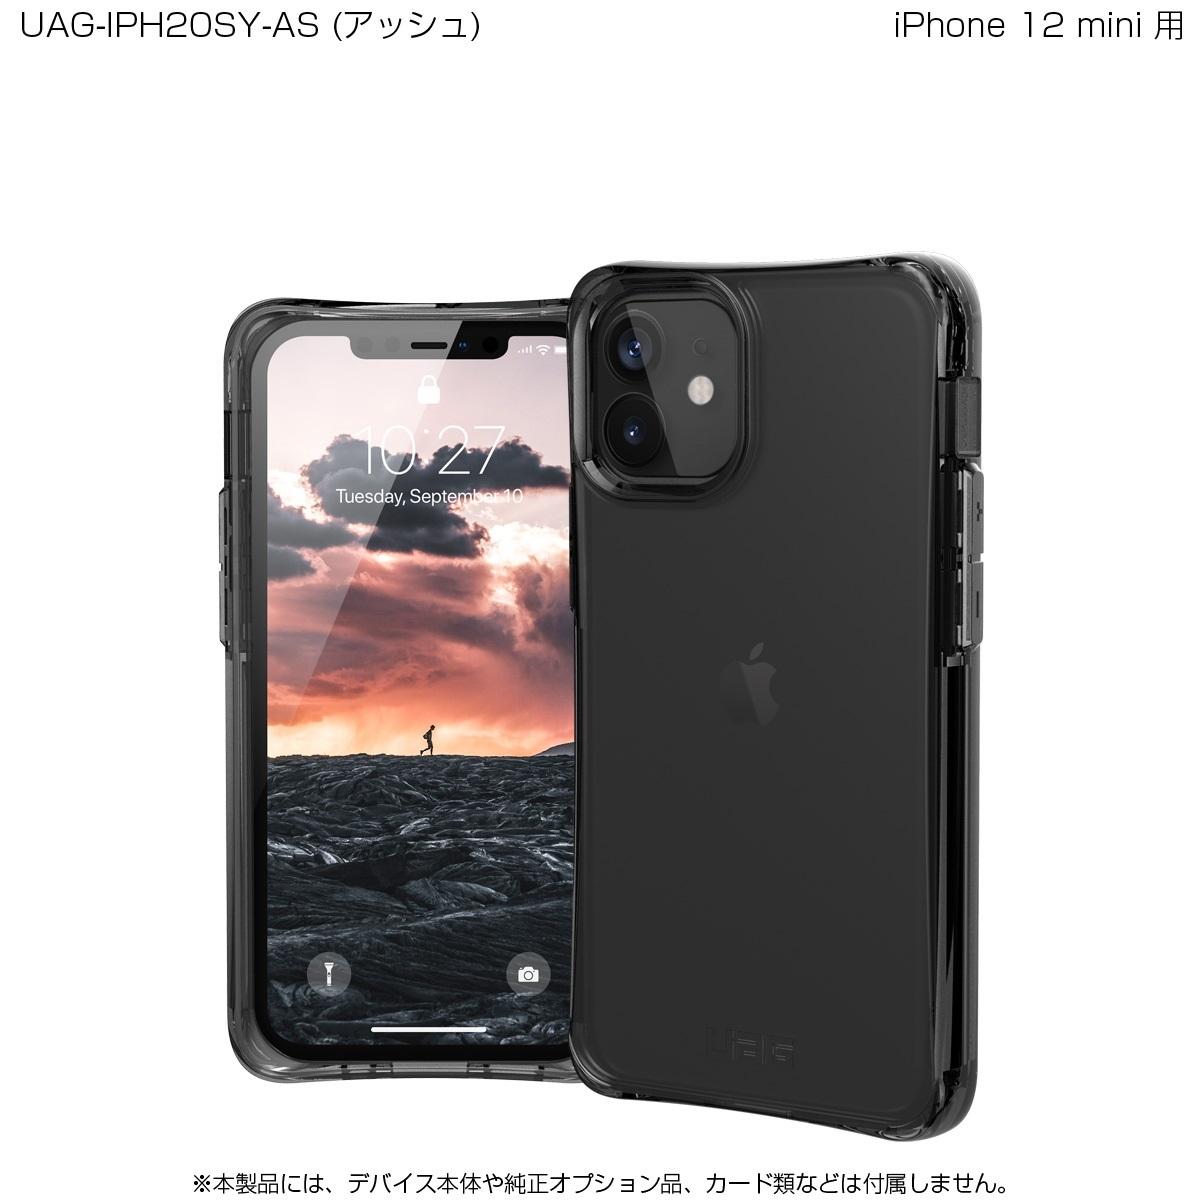 UAG iPhone 12 mini用 PLYOケース シンプル 全3色 耐衝撃 UAG-IPH20SYシリーズ 5.4インチ